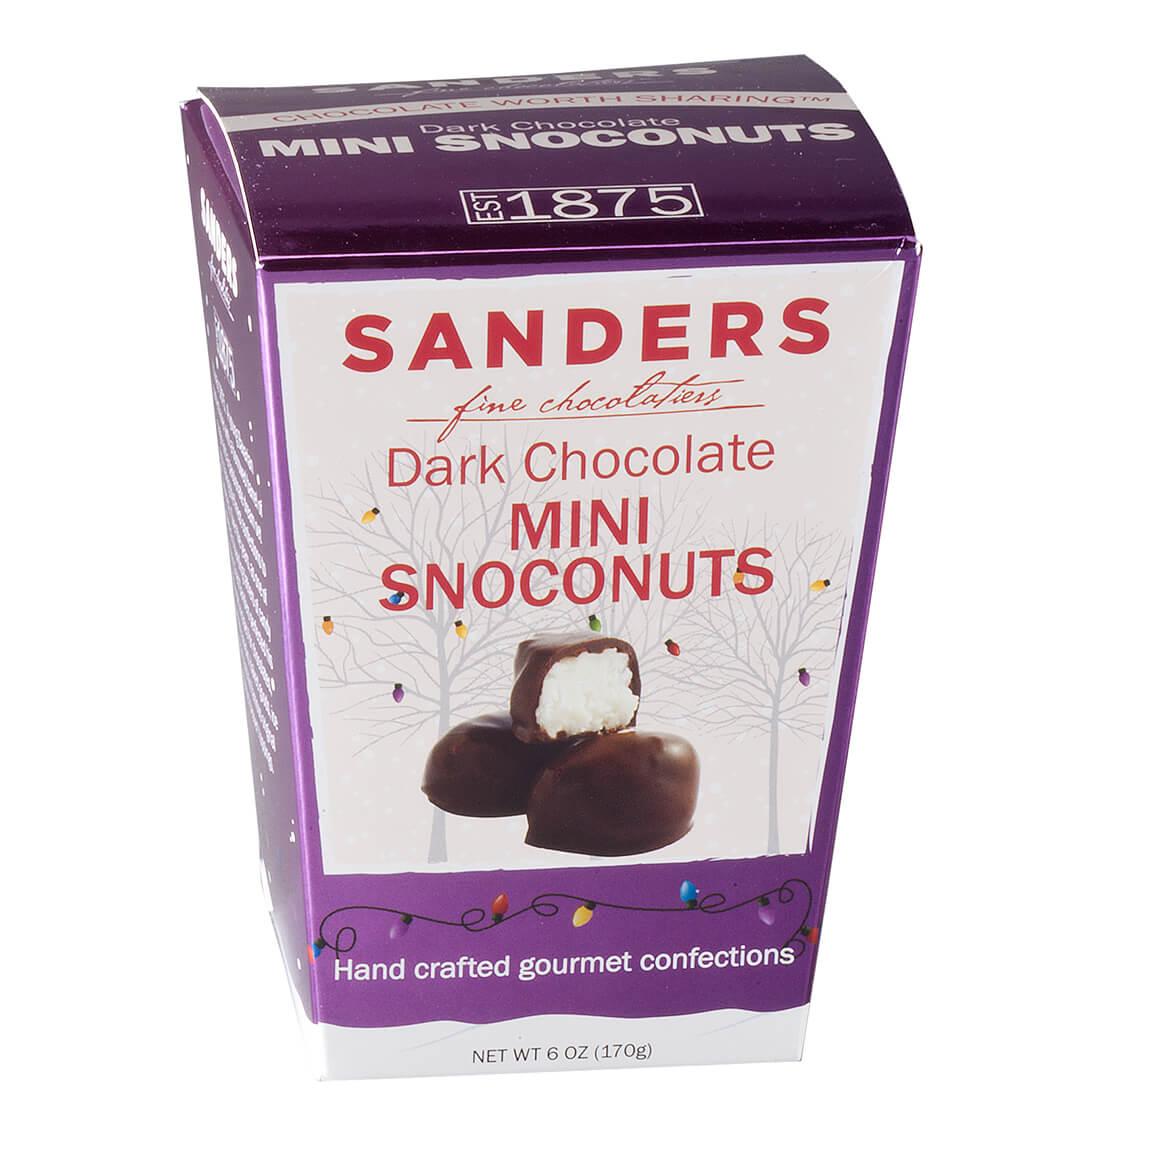 Sanders® Dark Chocolate Mini Snoconuts, 6 oz.-353549